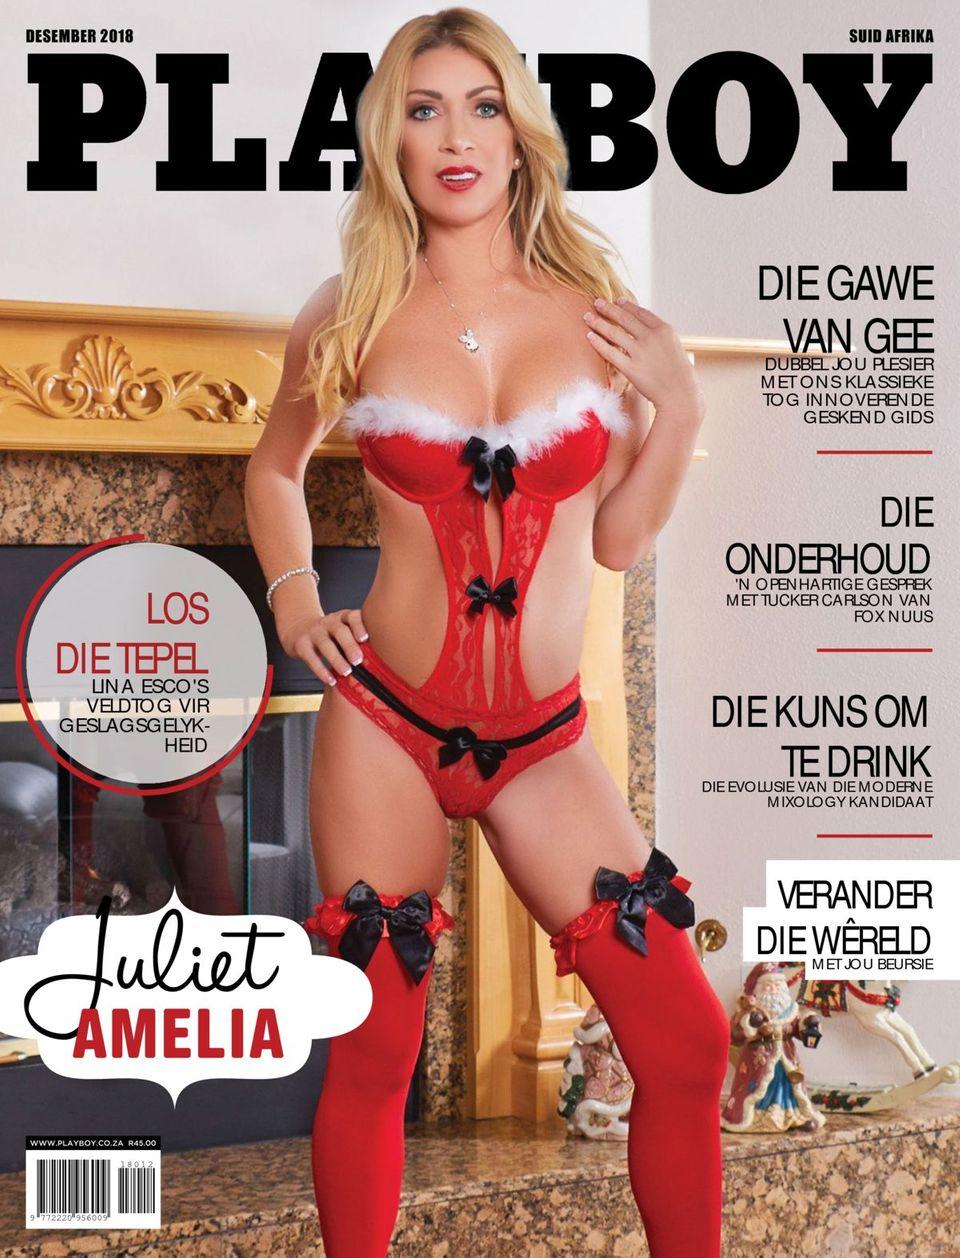 Playboy Suid Afrika-December 2018 Magazine - Get your